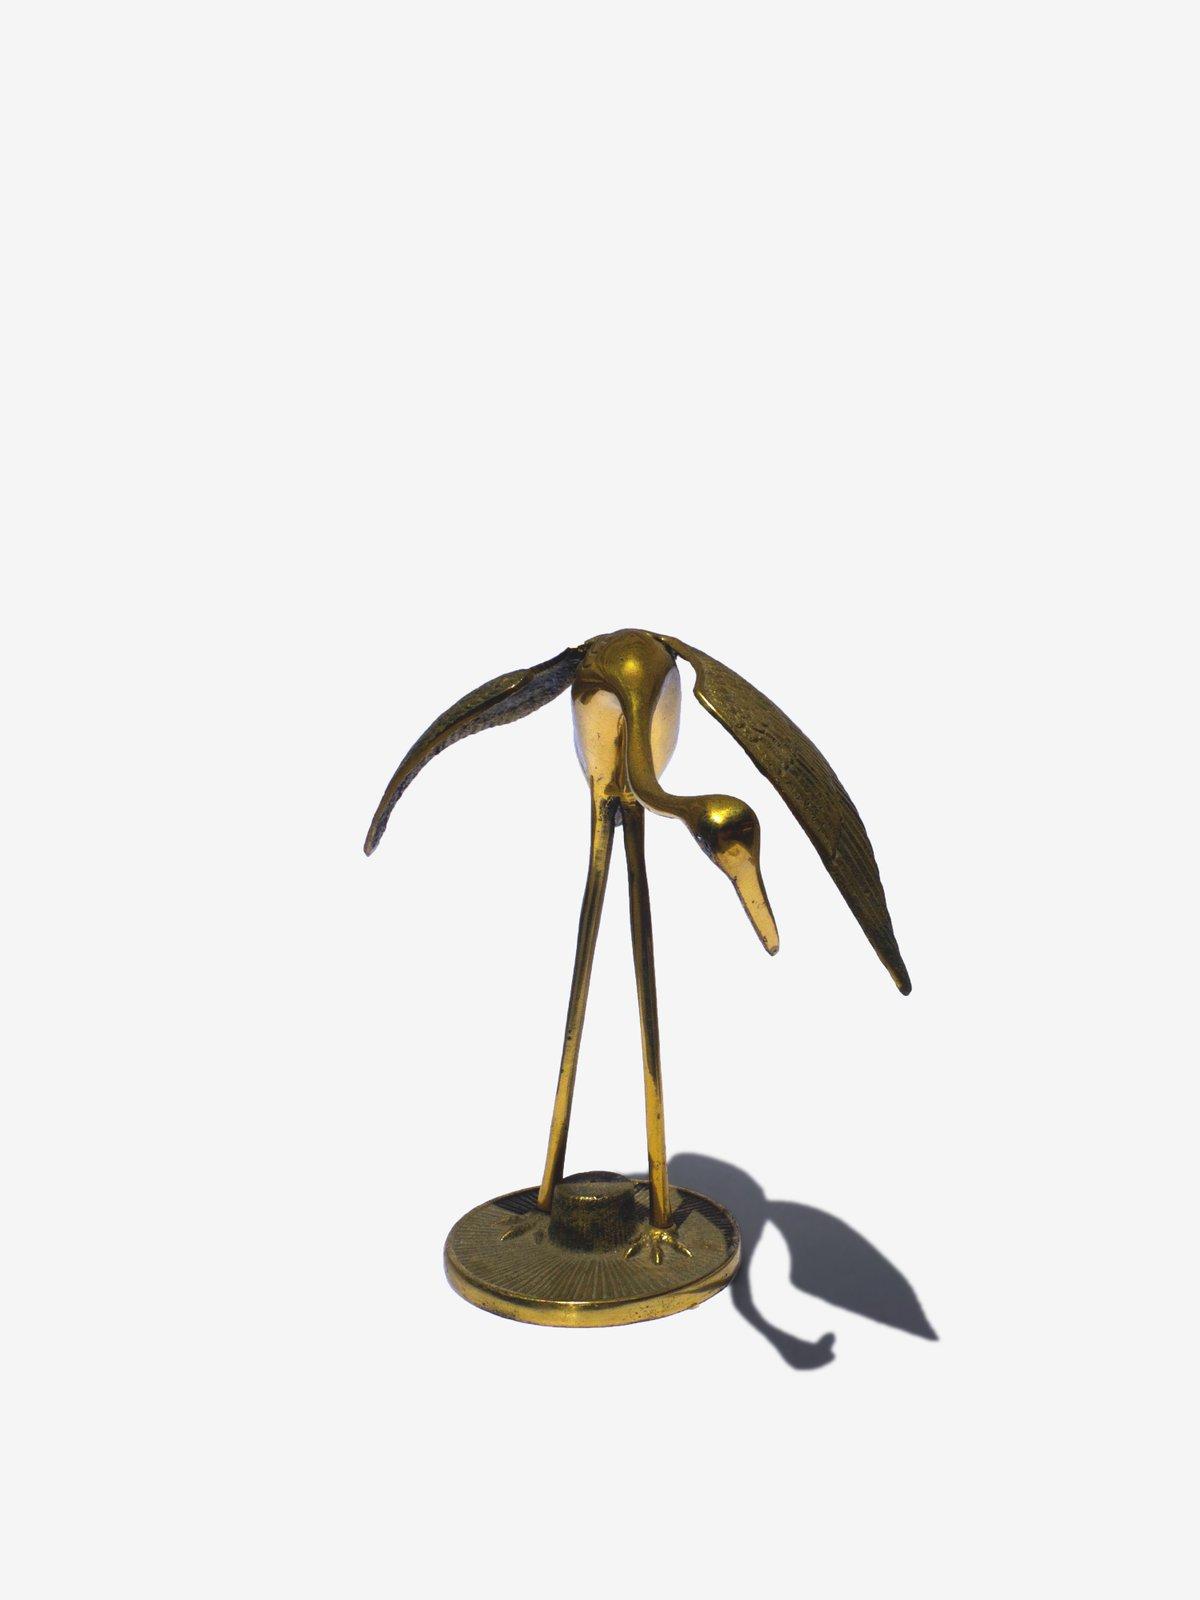 Image of Brass Crane